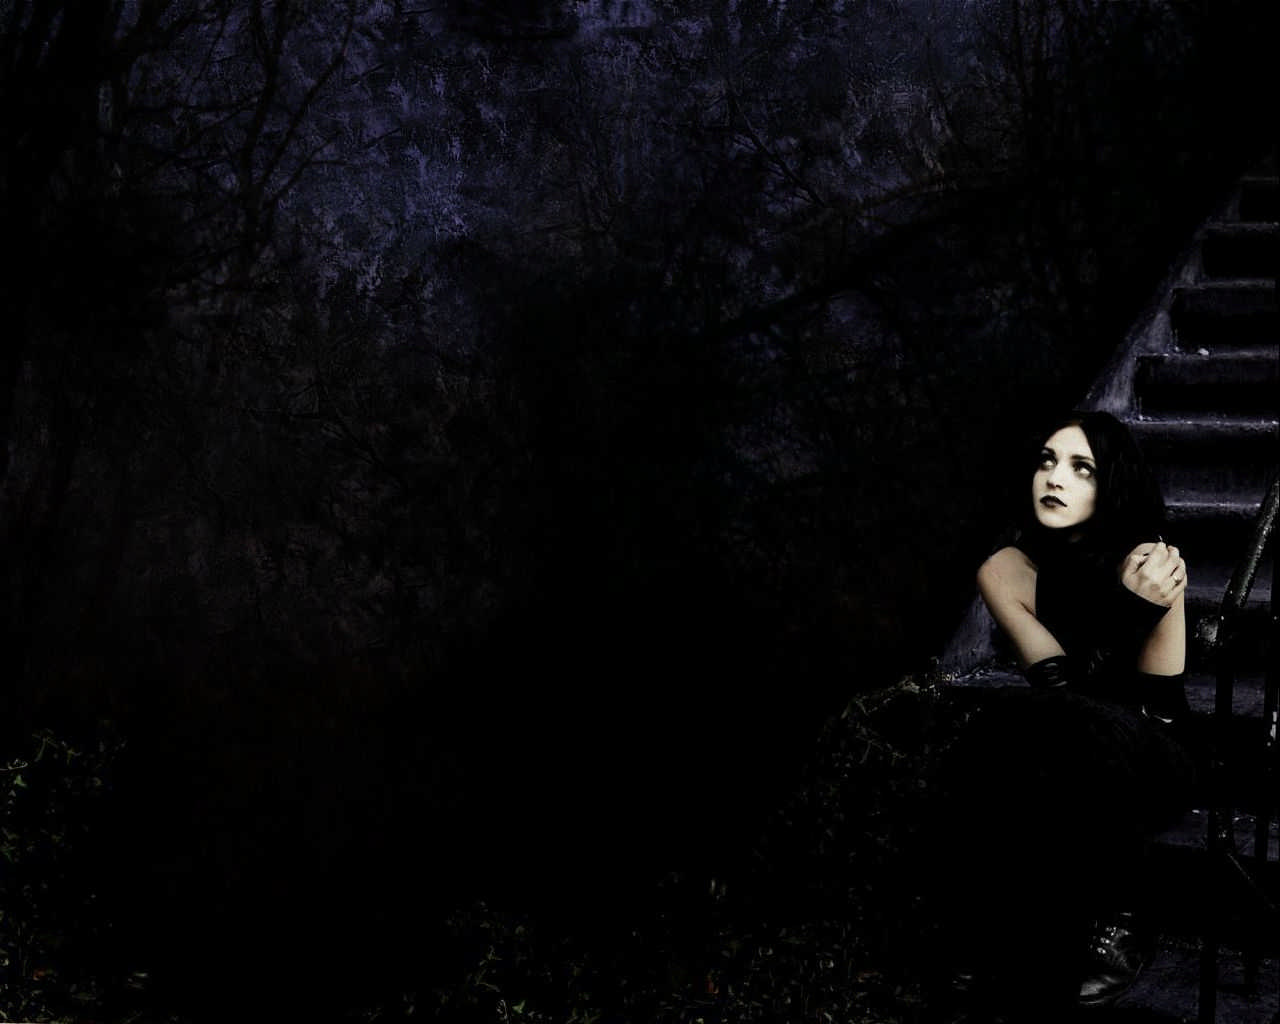 Gothic Vampire Backgrounds Dark Wallpaper 30 Hd W...